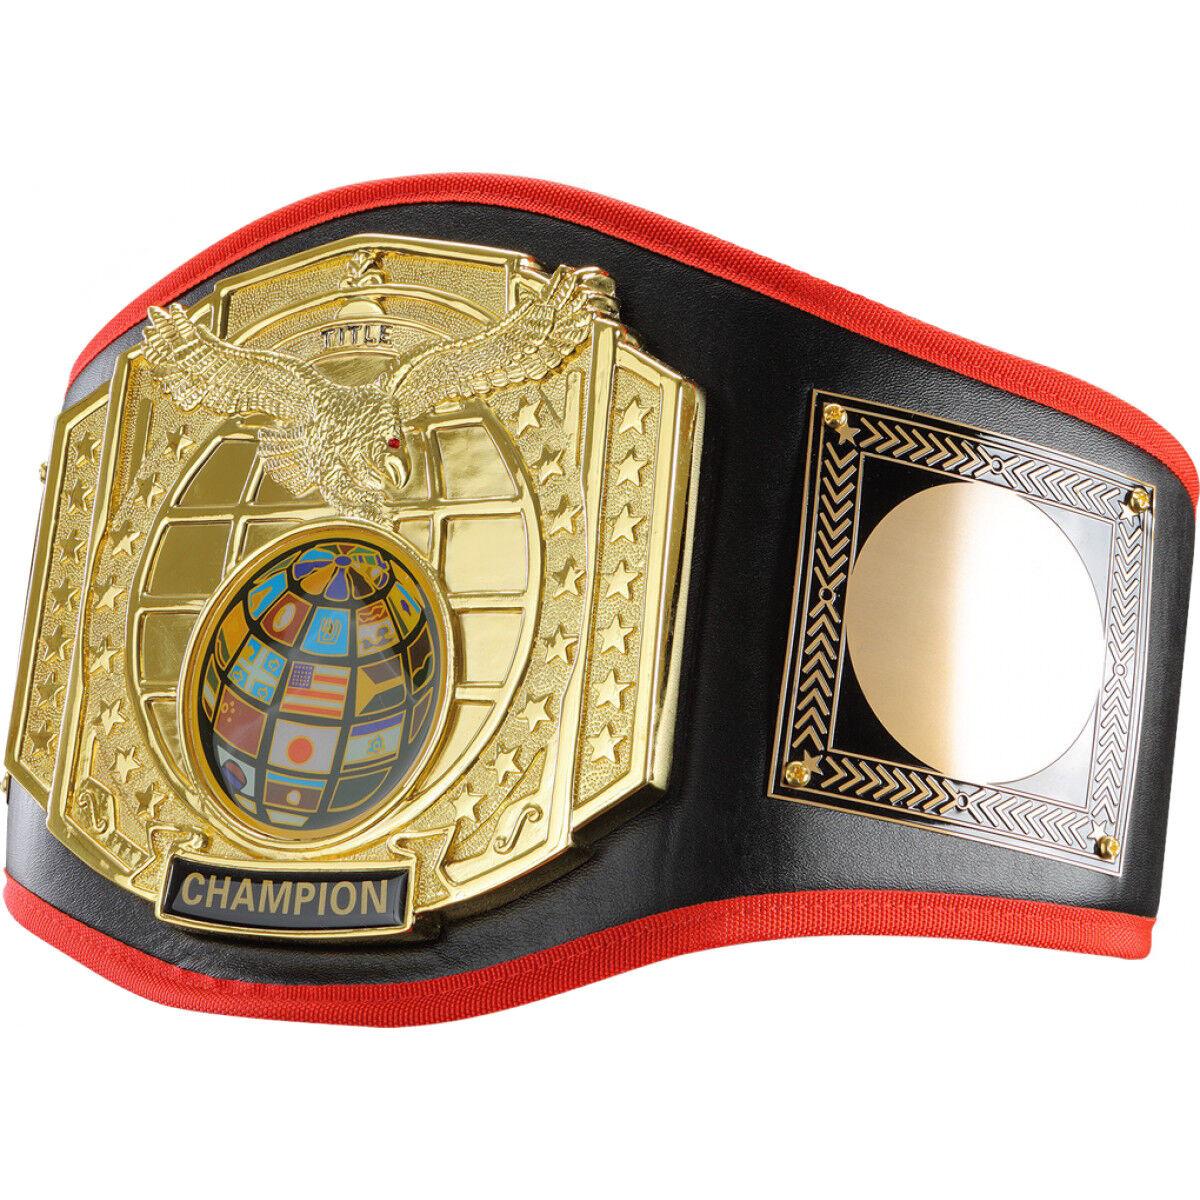 Titel Boxing Gold-Plated Centerplate Leather Platinum Titel Belt